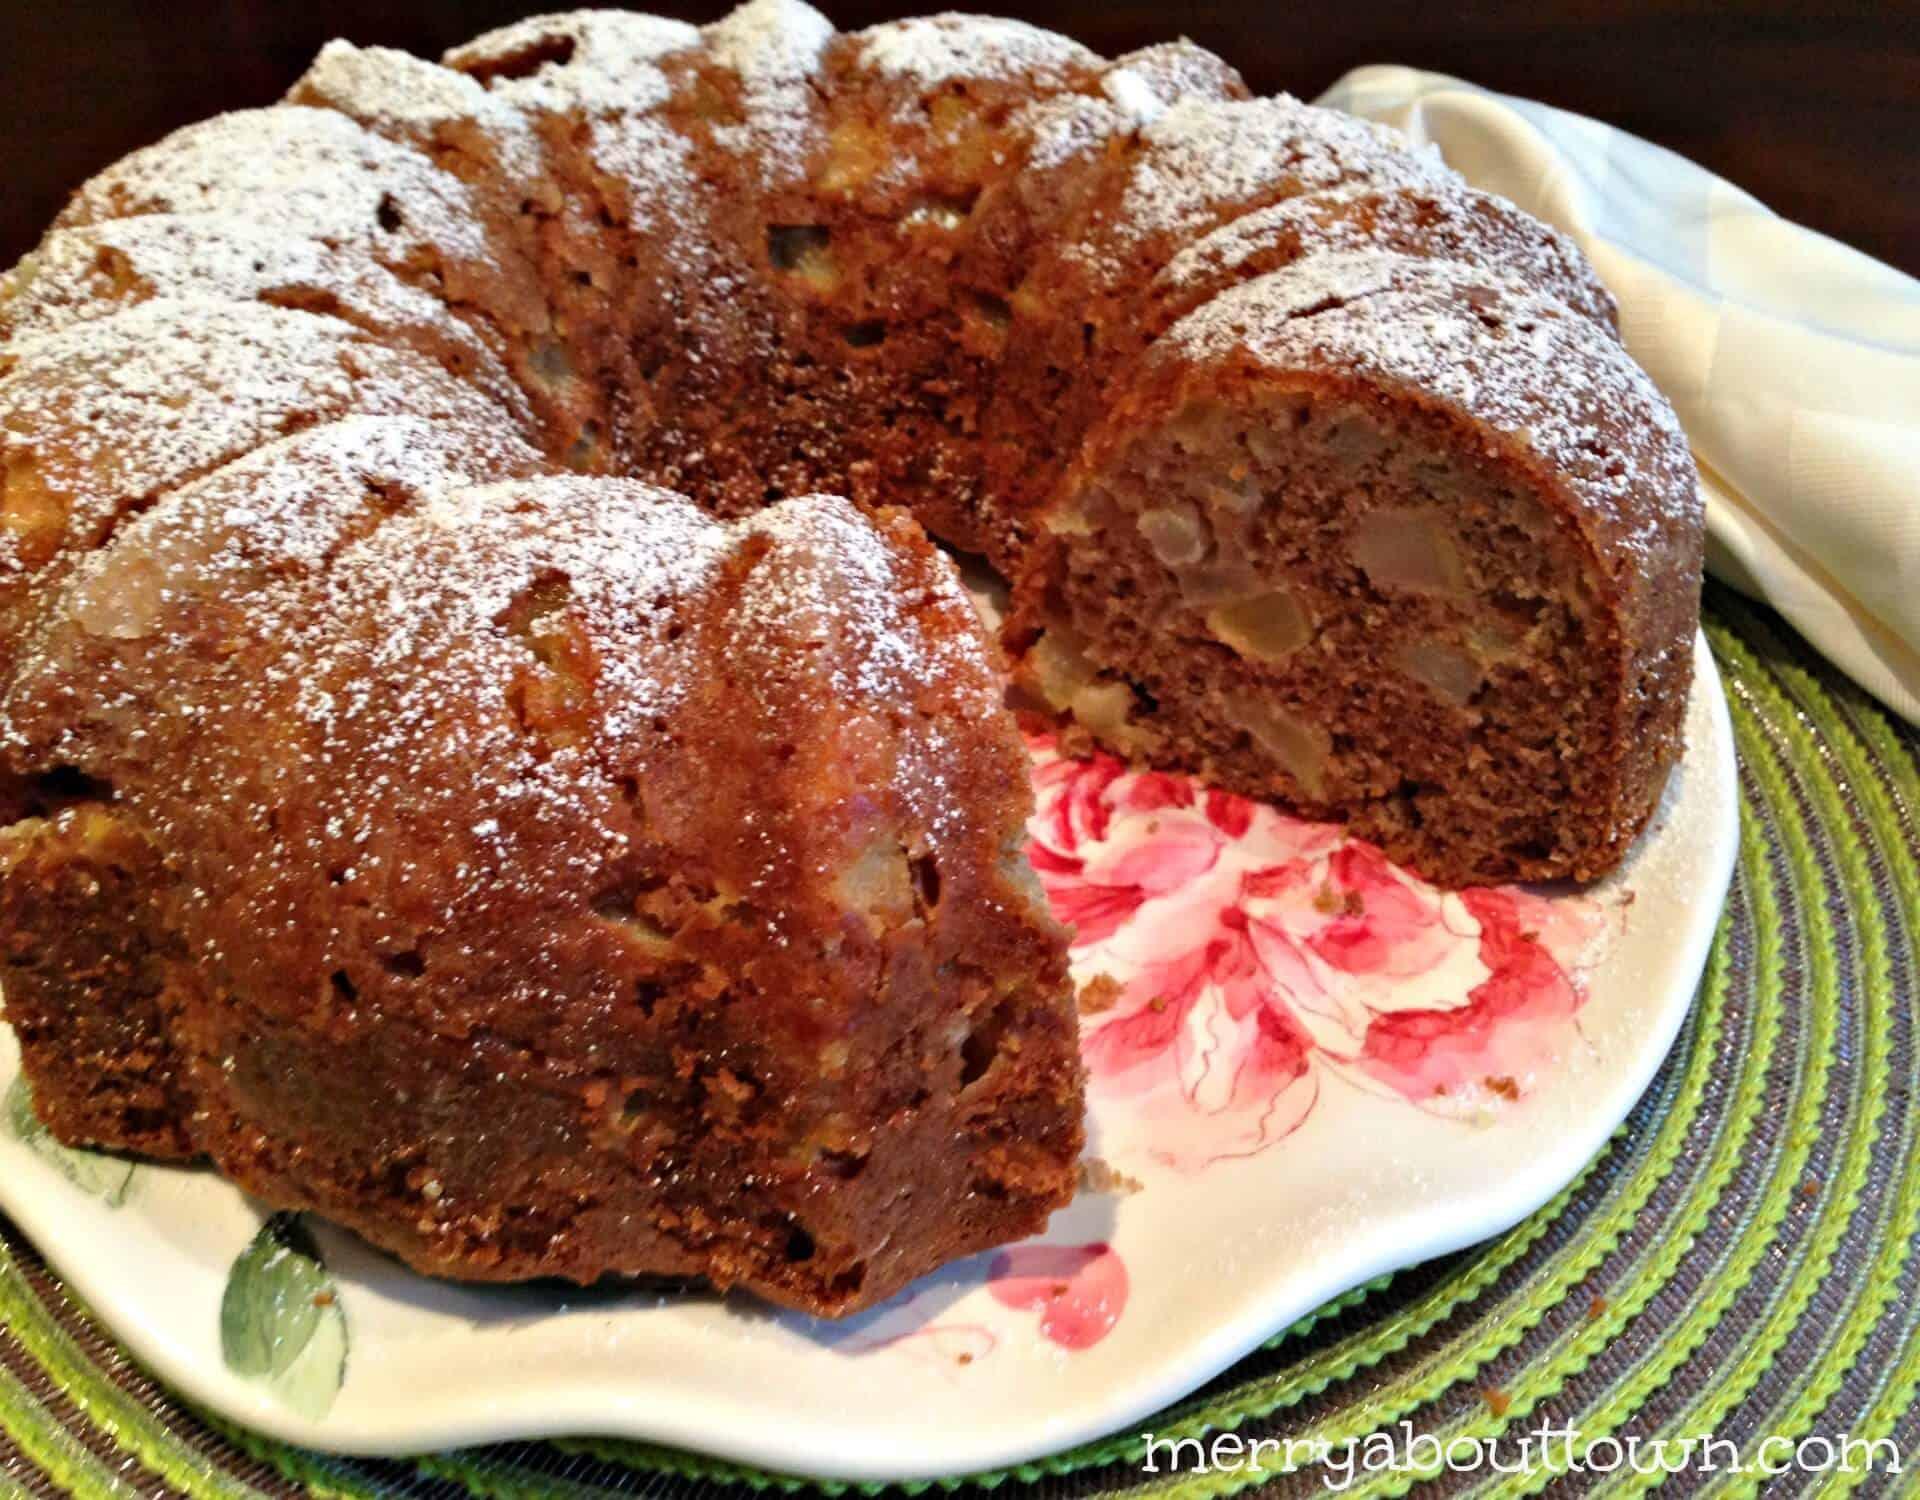 Pear Apple Spice Bundt Cake